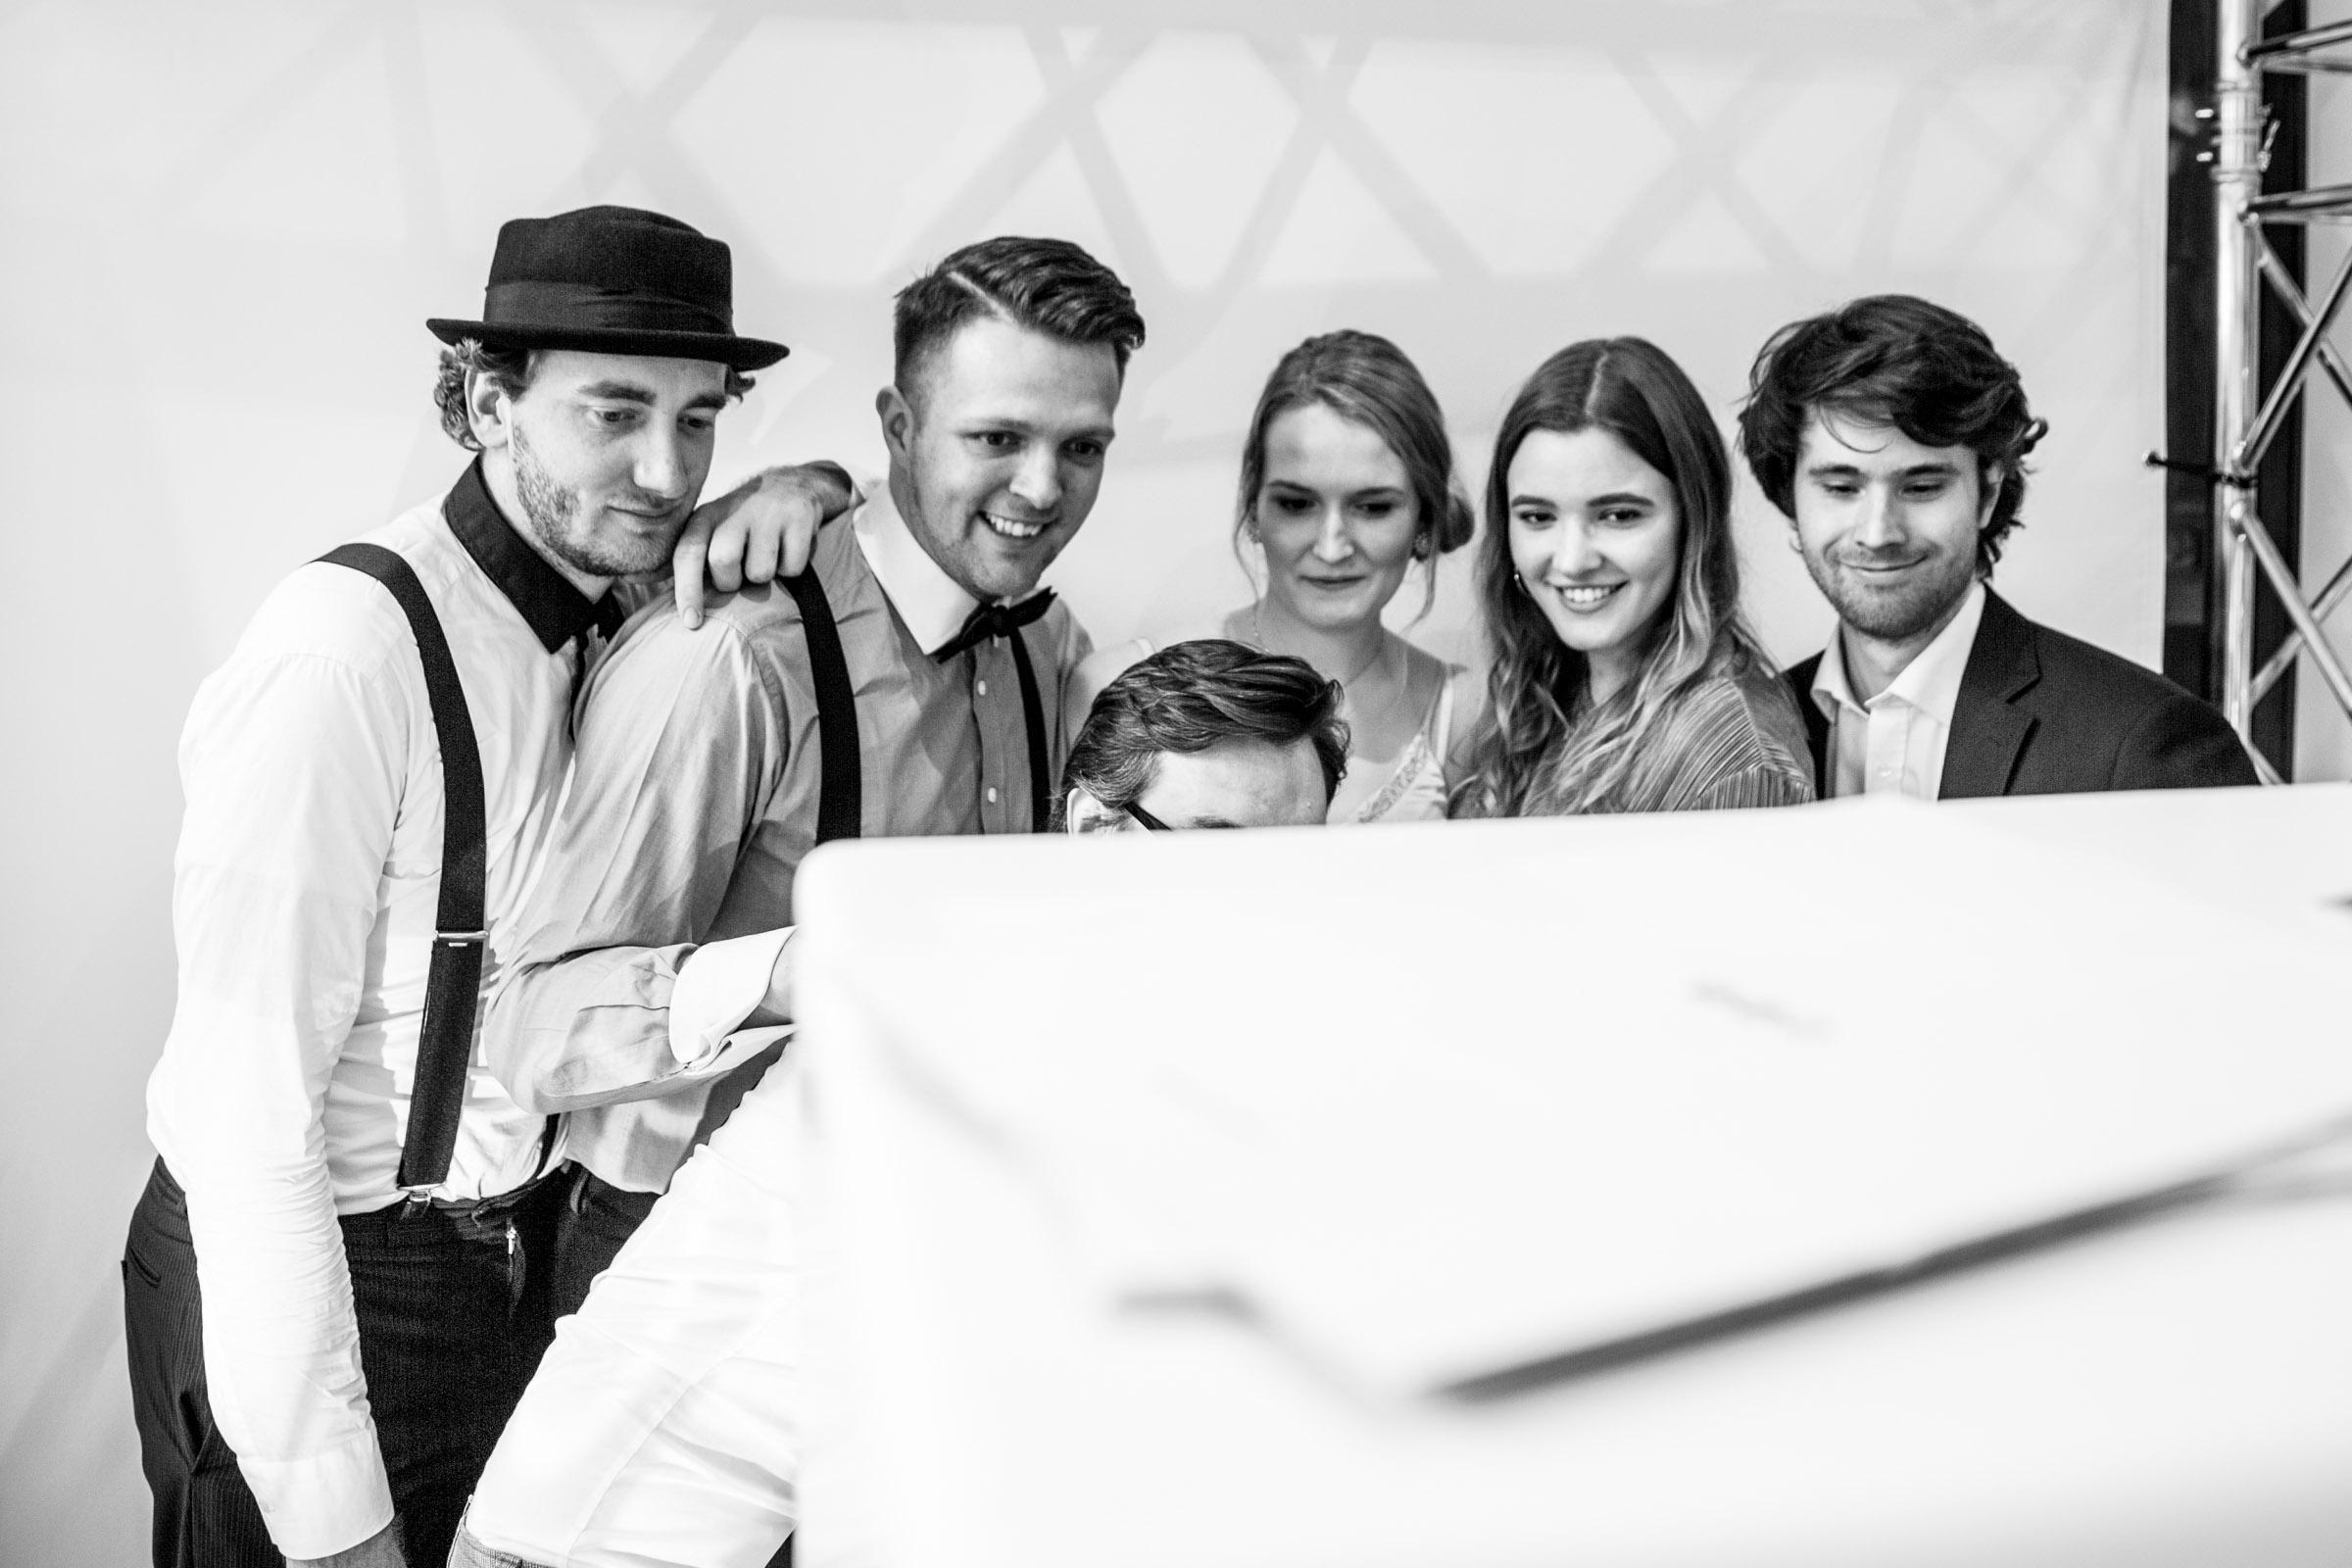 Popband  Hannover   Livemusik  Partyband   Liveband   Swingband   Team   Hochzeitsmesse   Jazzband   Soul  Motown   Swing   Hochzeit   Messe  Firmenfeier   Messeparty   Dinner   Empfang   Gala   Charity   Buchen  Anfragen